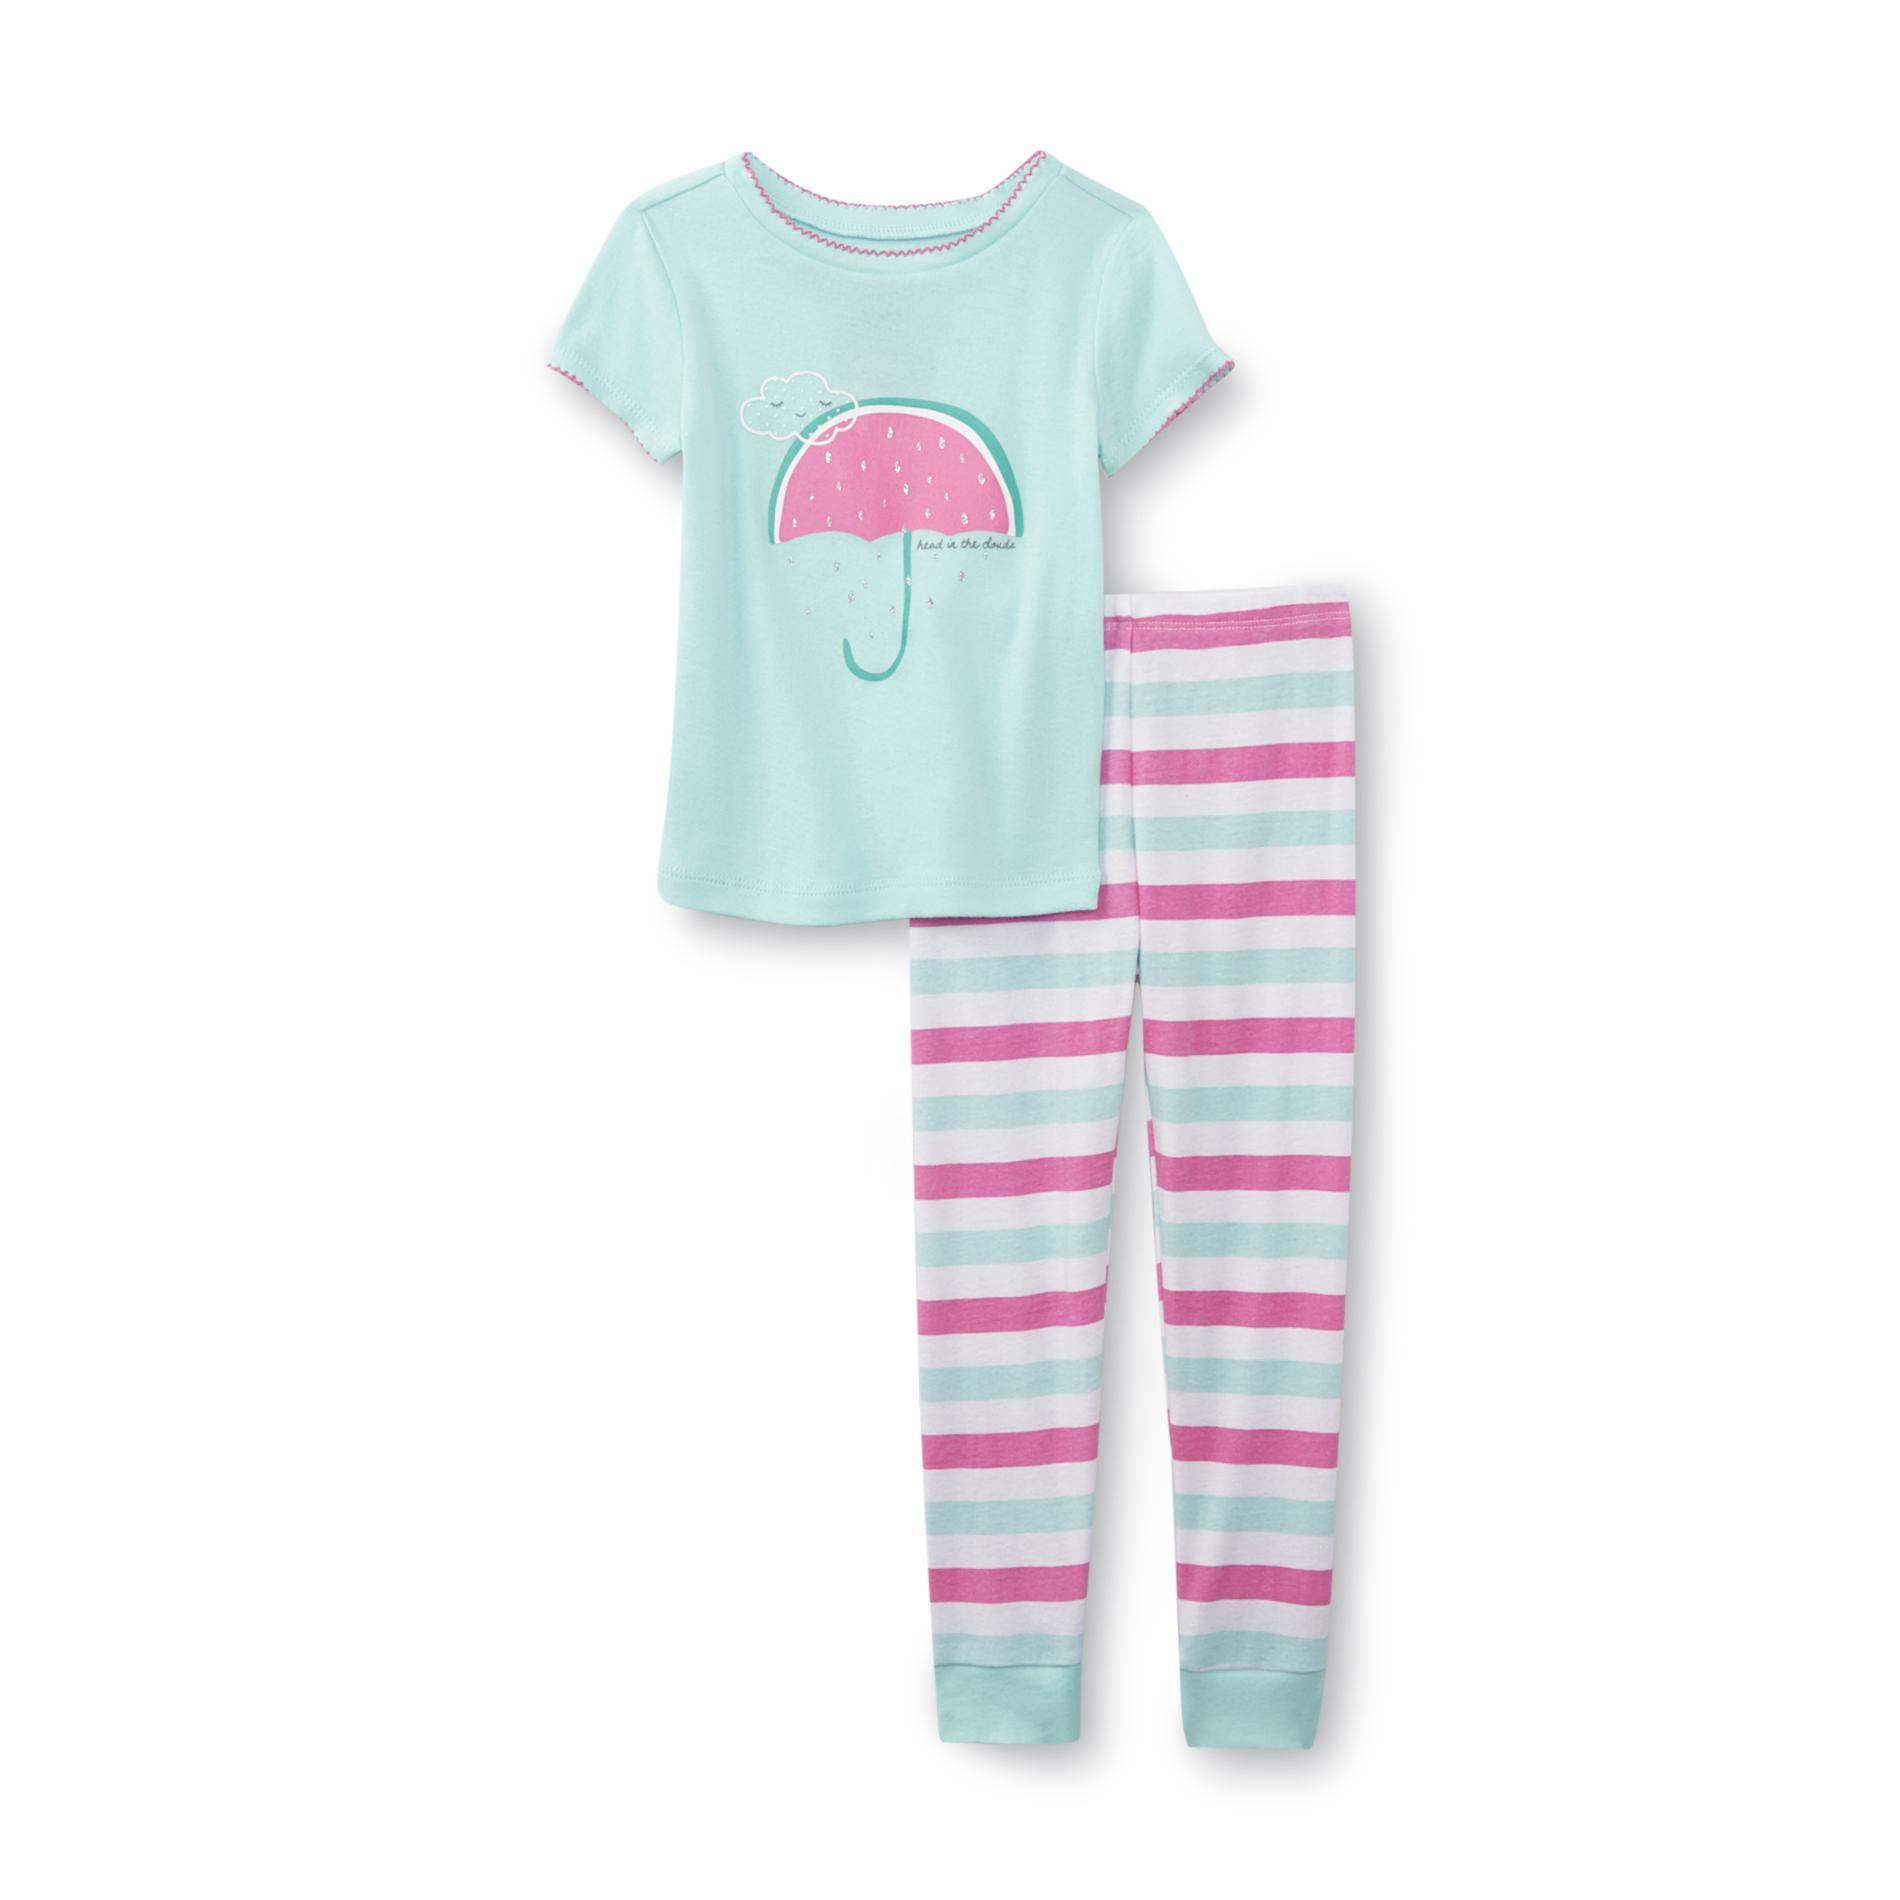 Joe Boxer Infant & Toddler Girl's Pajama Shirt & Pants - Umbrella & Striped